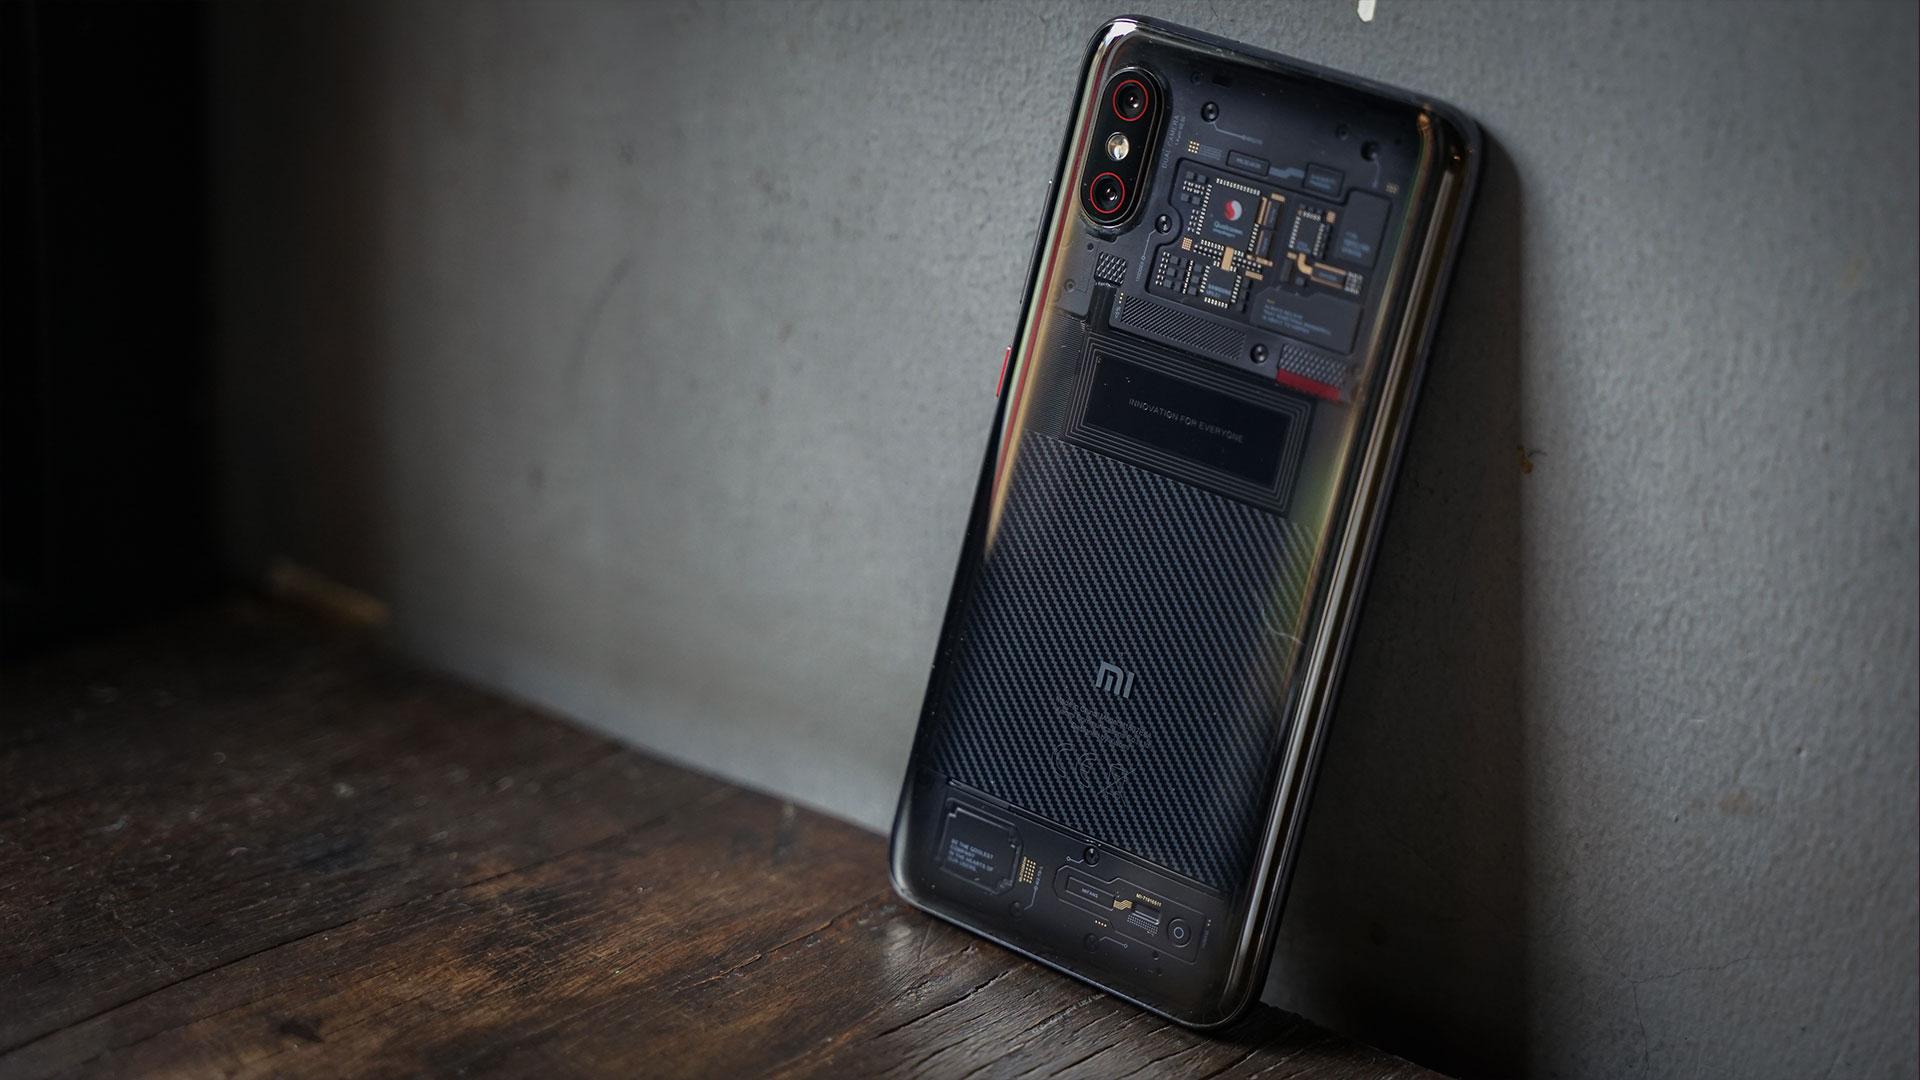 Xiaomi Mi 8 Pro Smartphone Offered for $499 99: Best Price